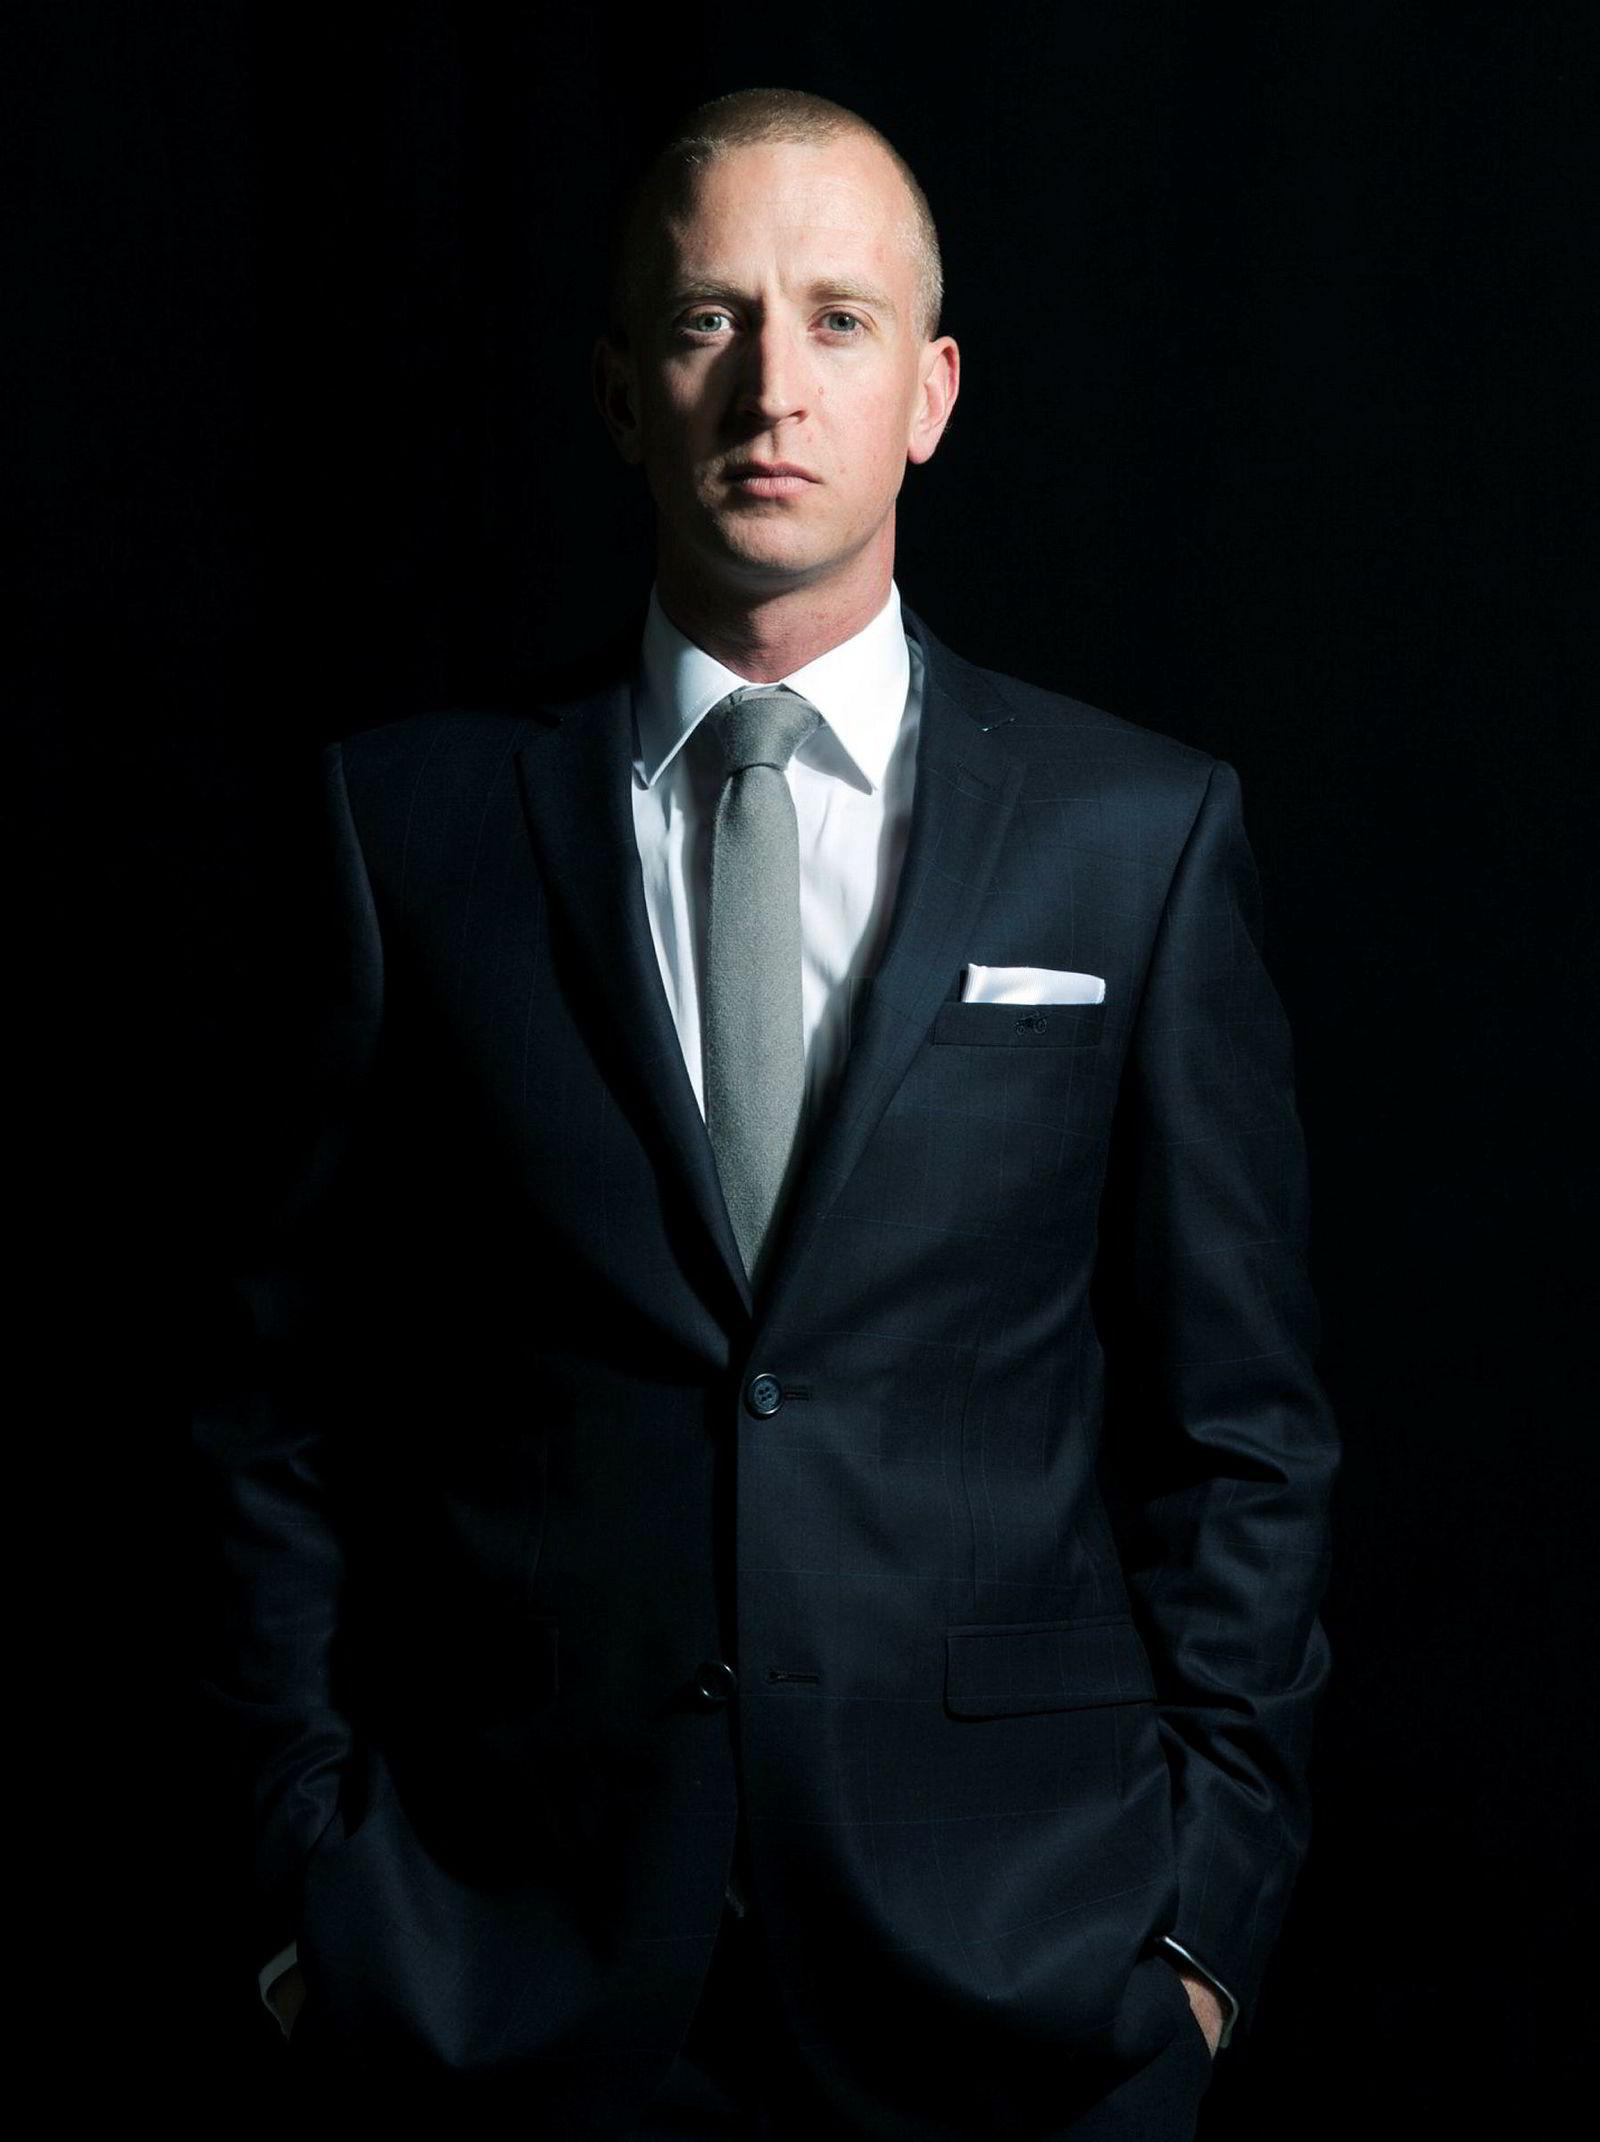 Gunnar Greve er manageren til Alan Walker.